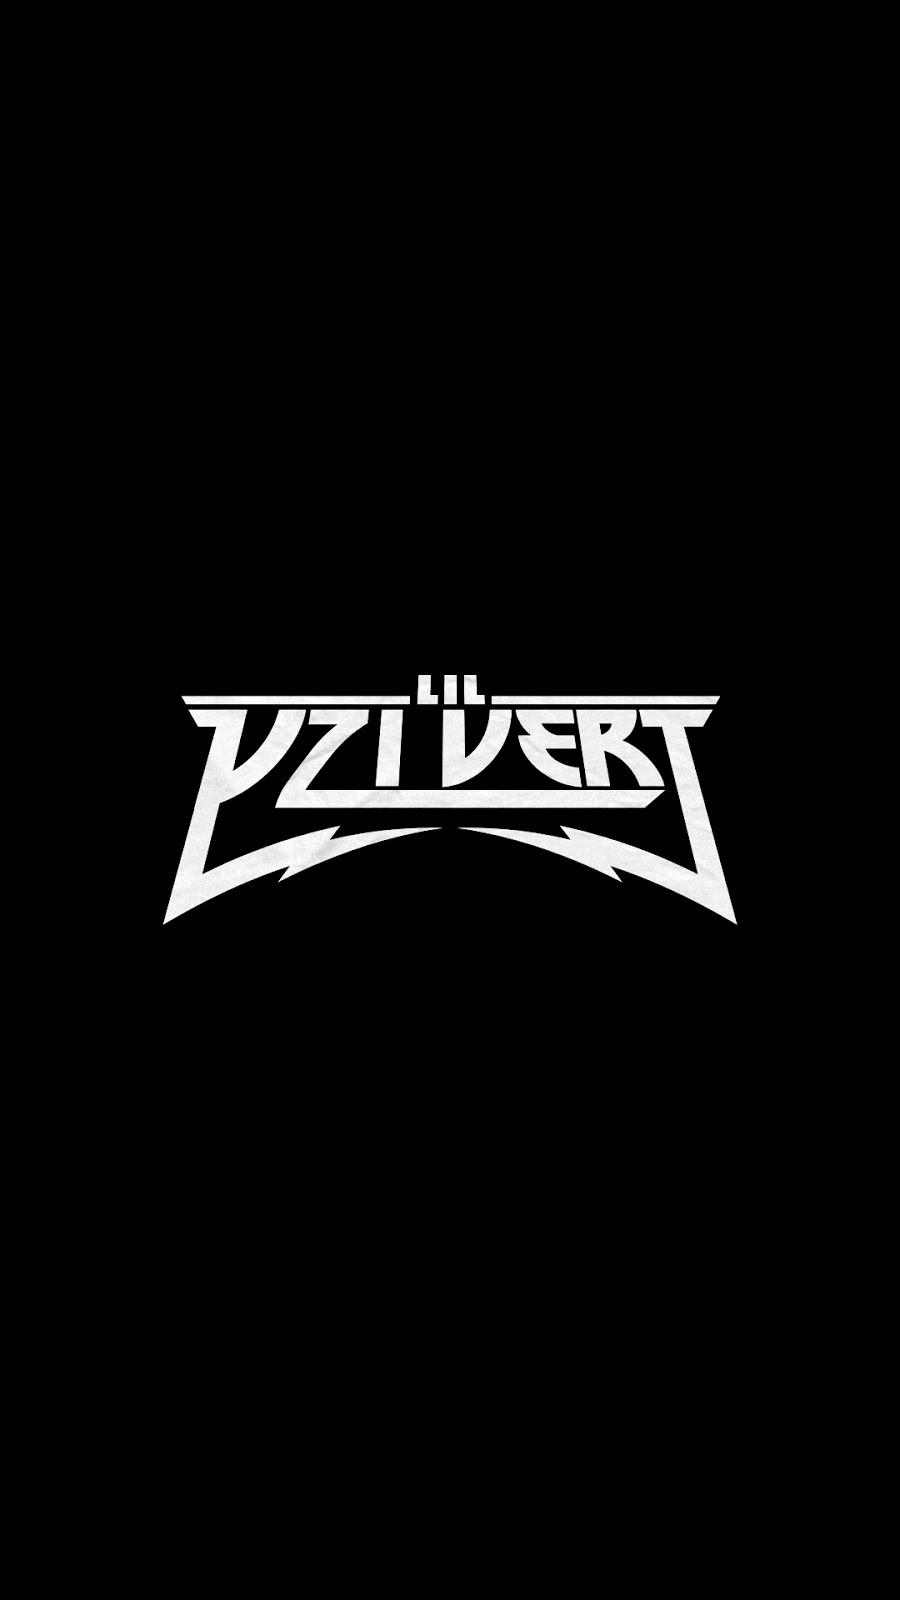 Lil Uzi Vert Wallpaper 1080p Heroscreen